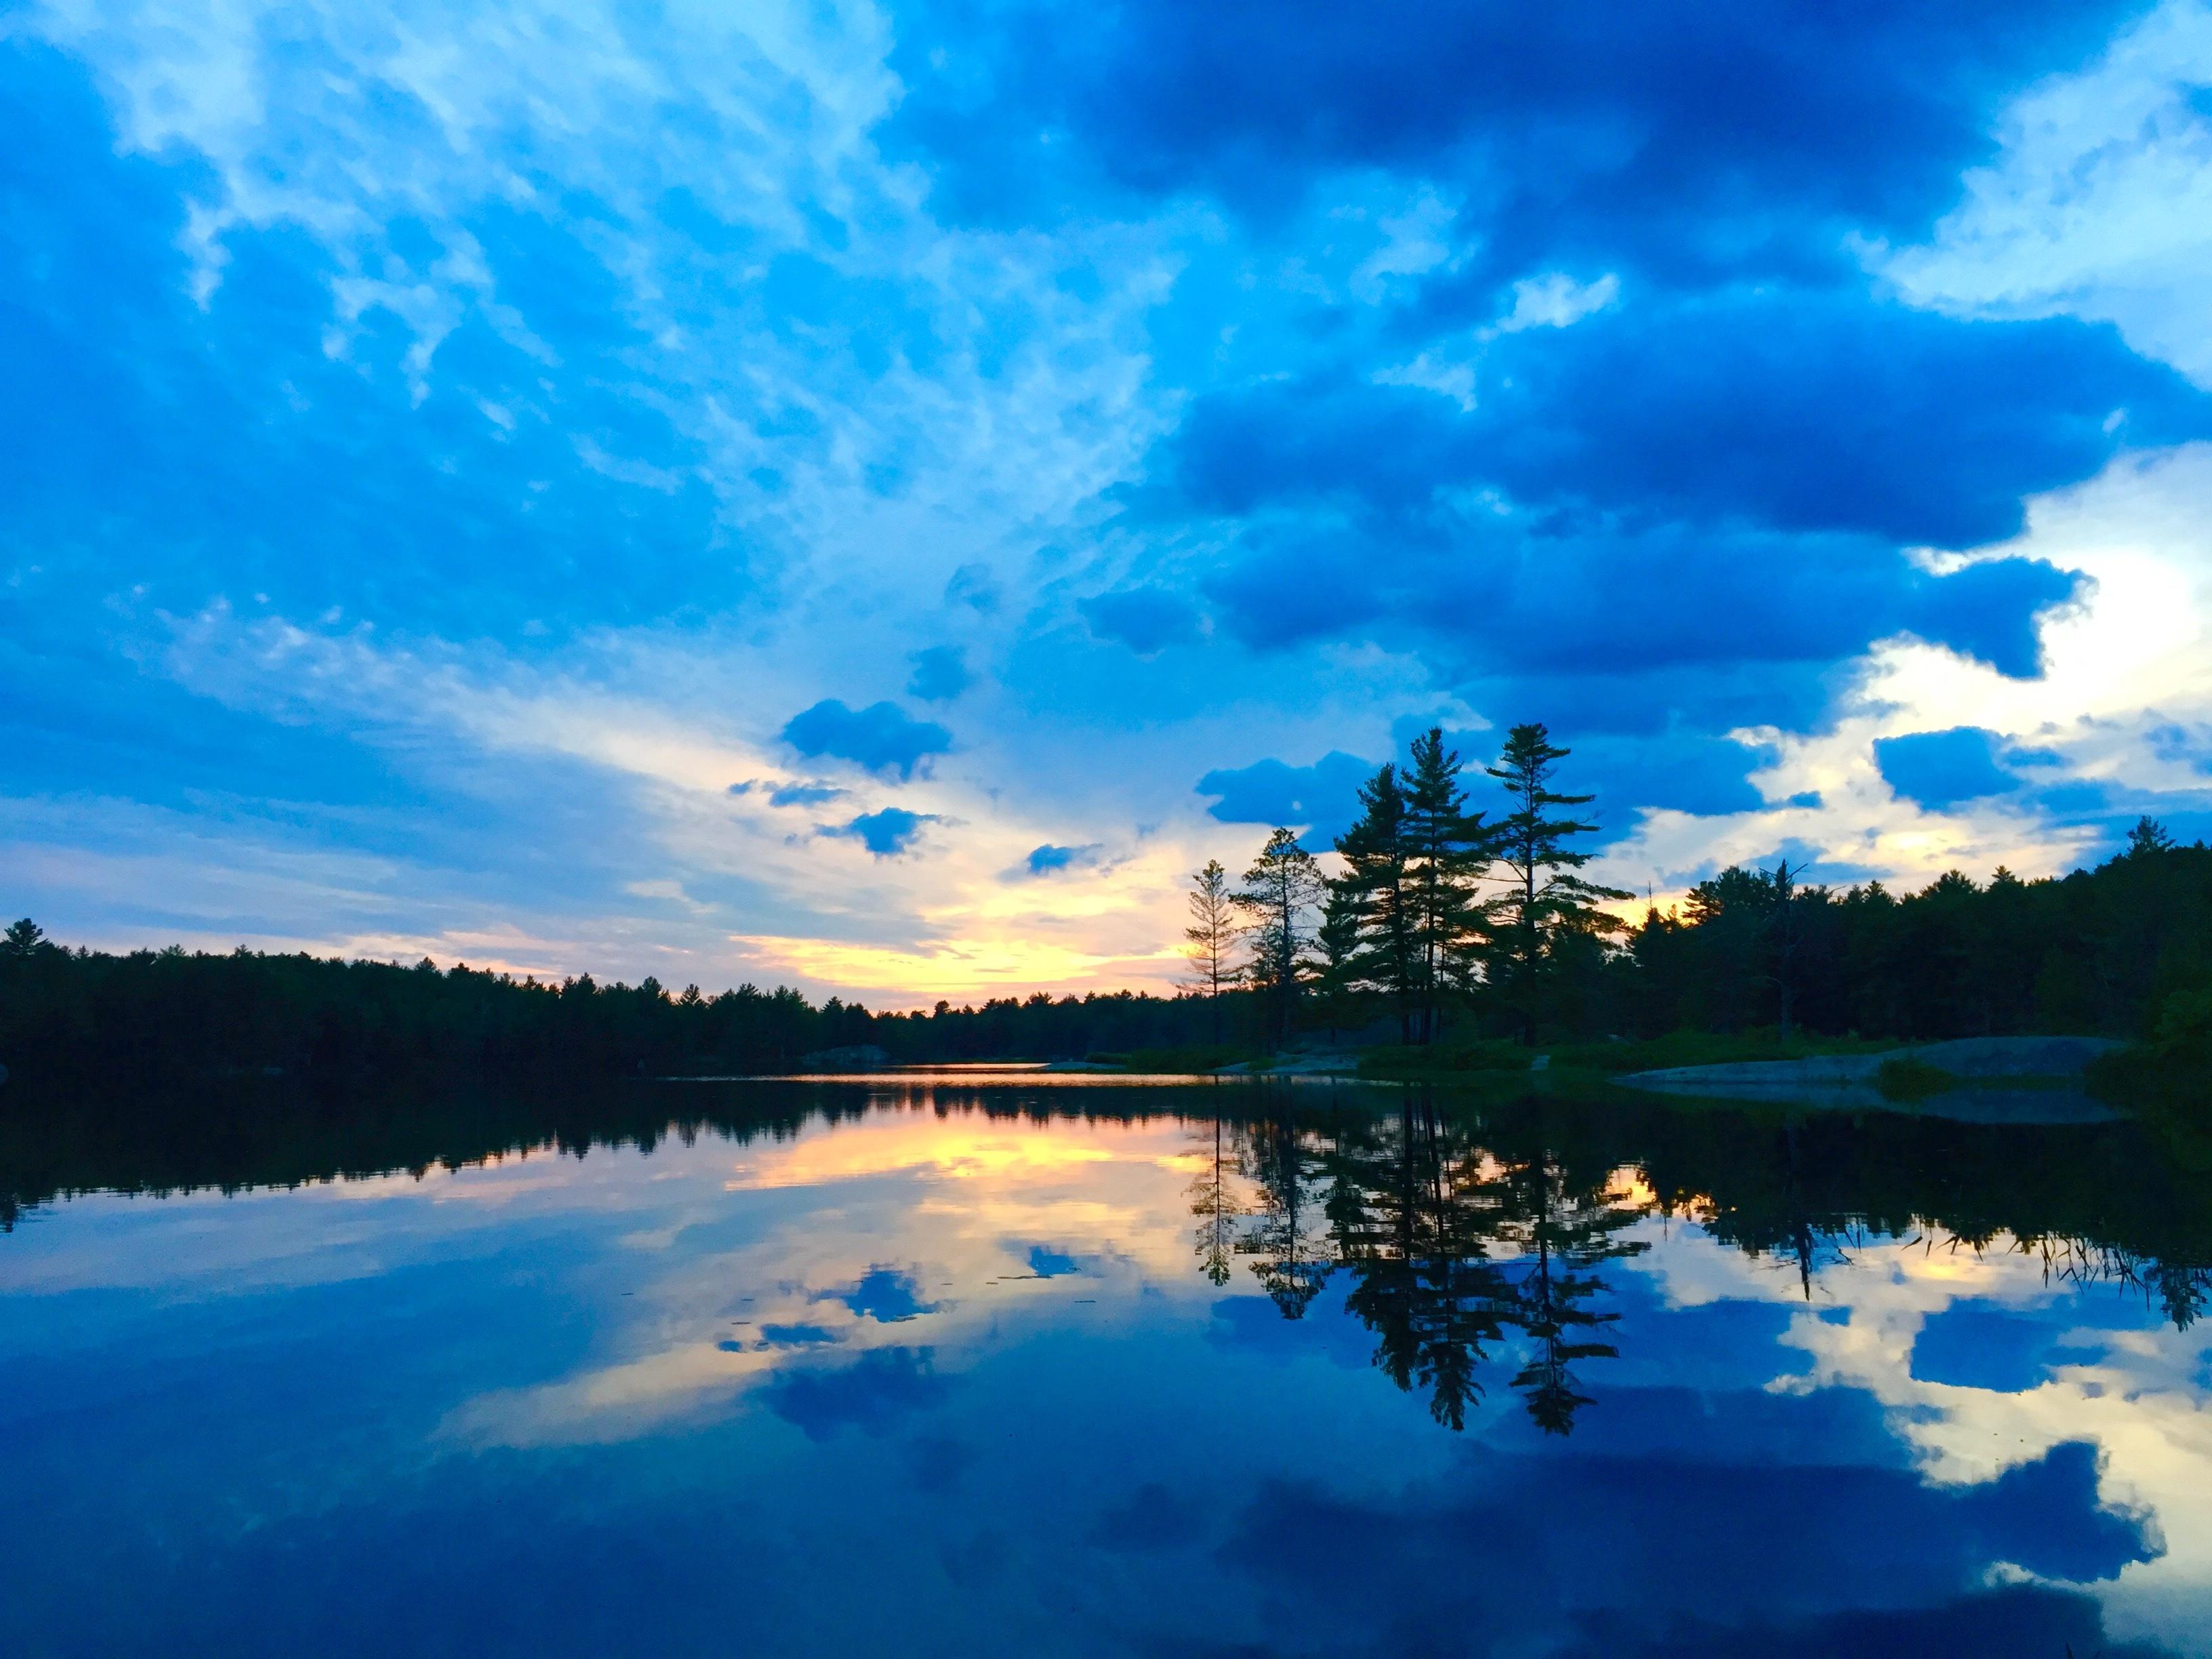 Water, Blue, Lake, Reflection, River, HQ Photo